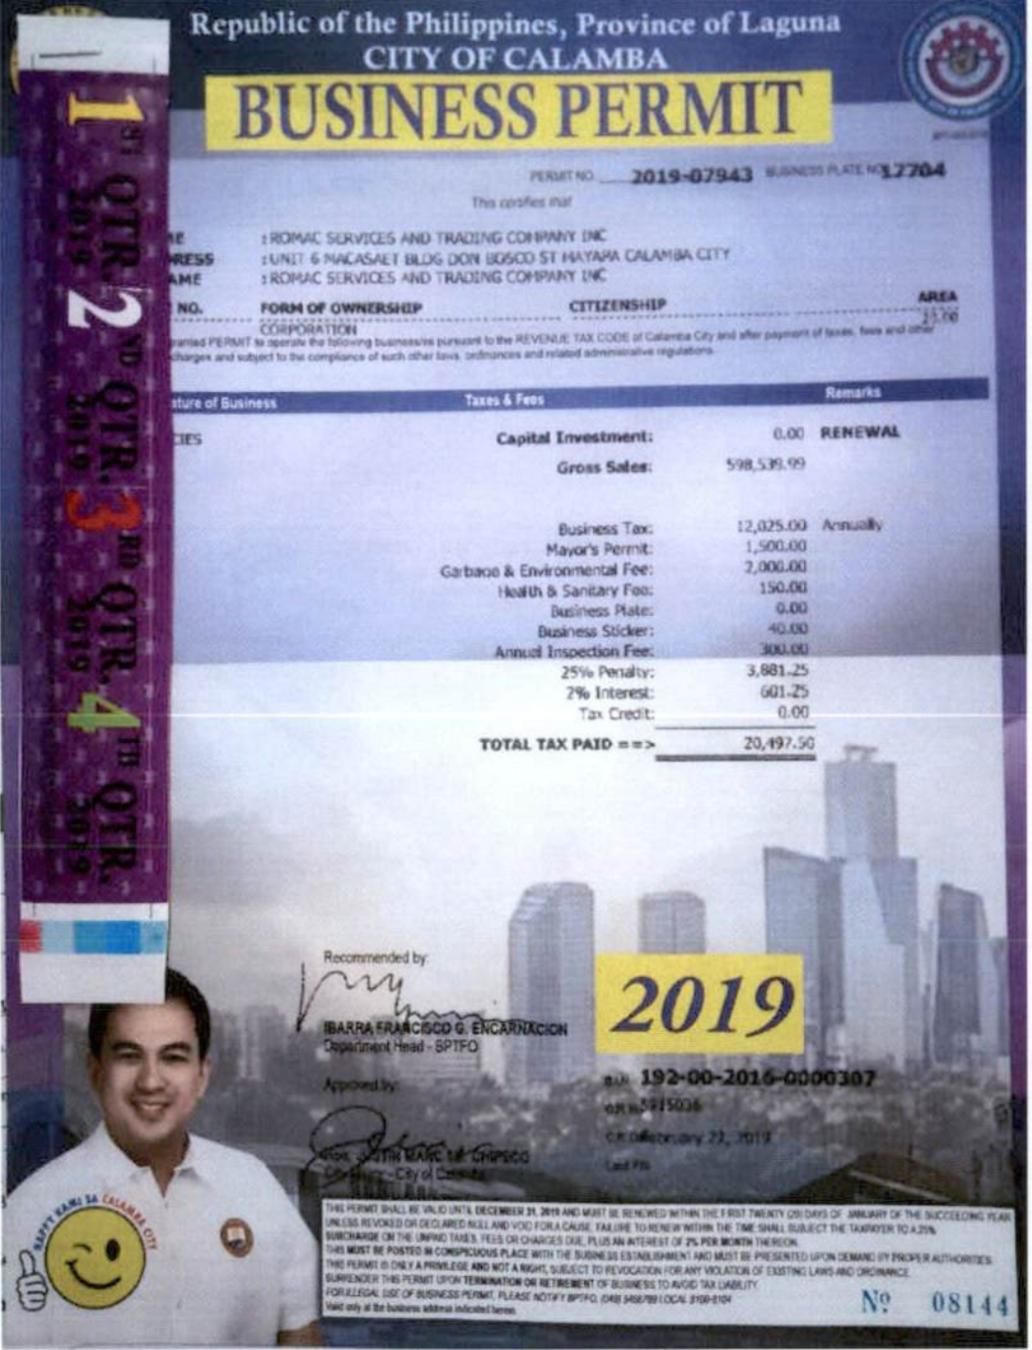 Calamba Laguna Business Permit 2019